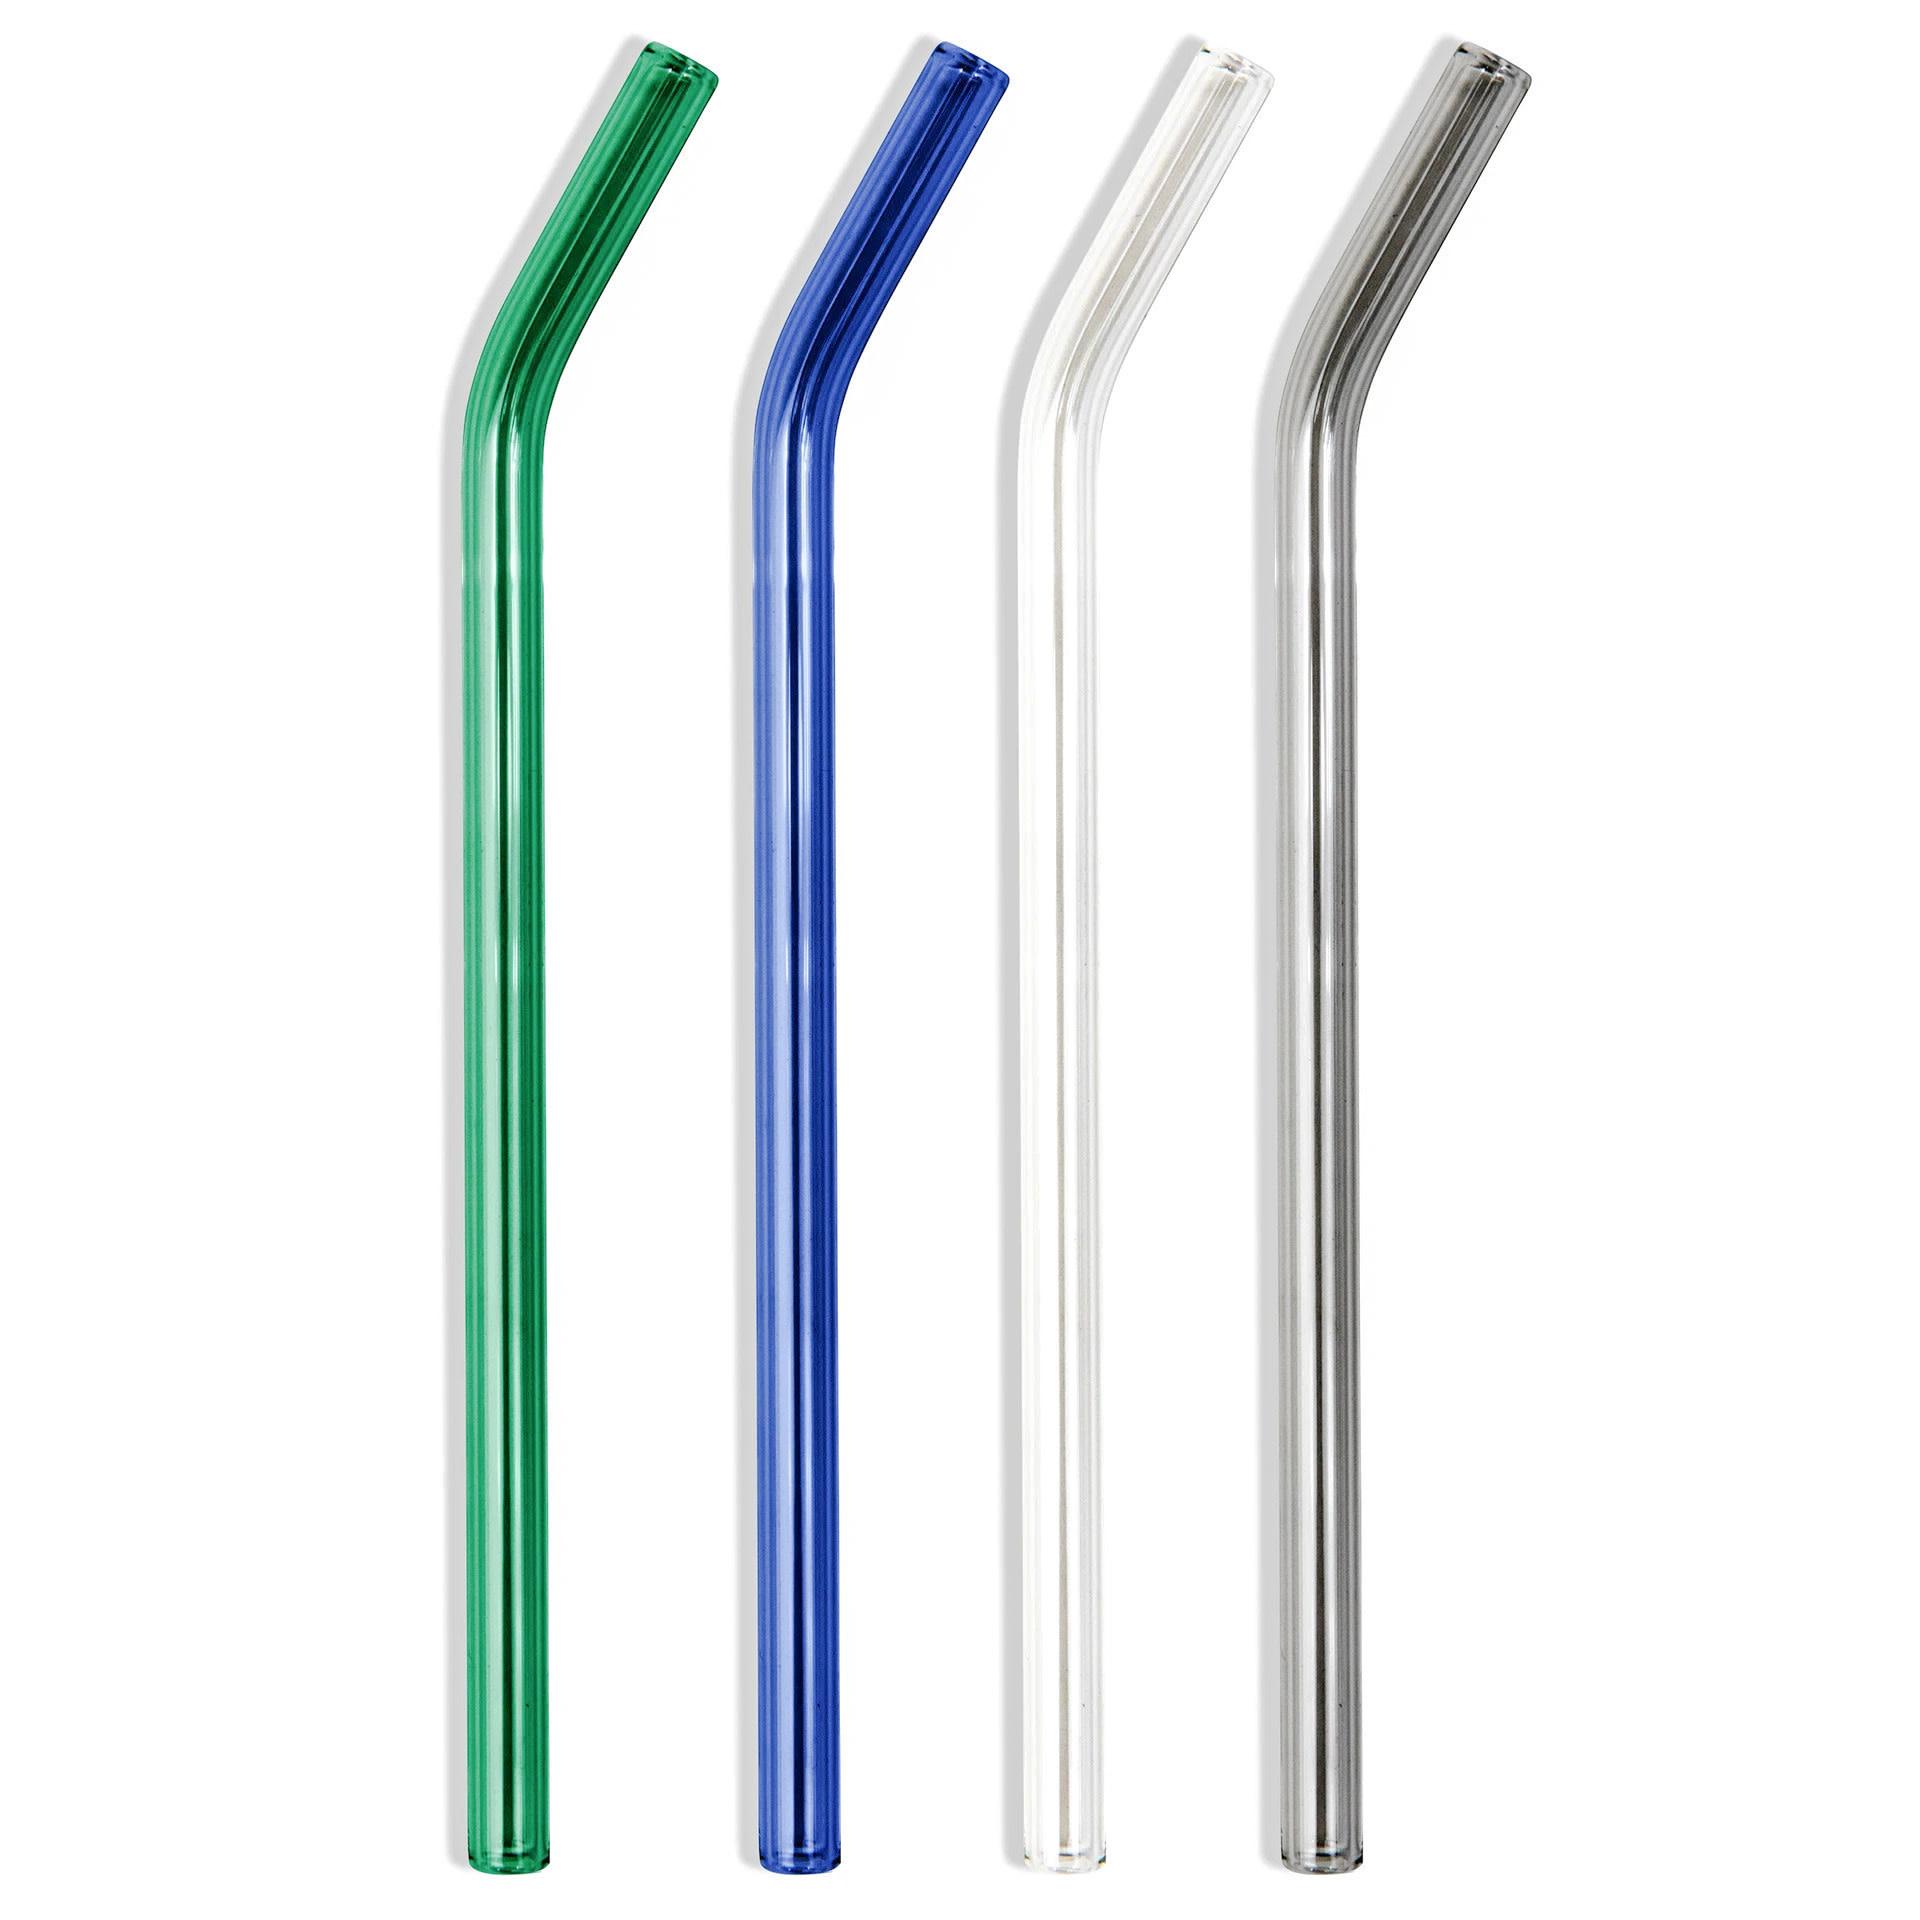 POKETO Glass Straw Set